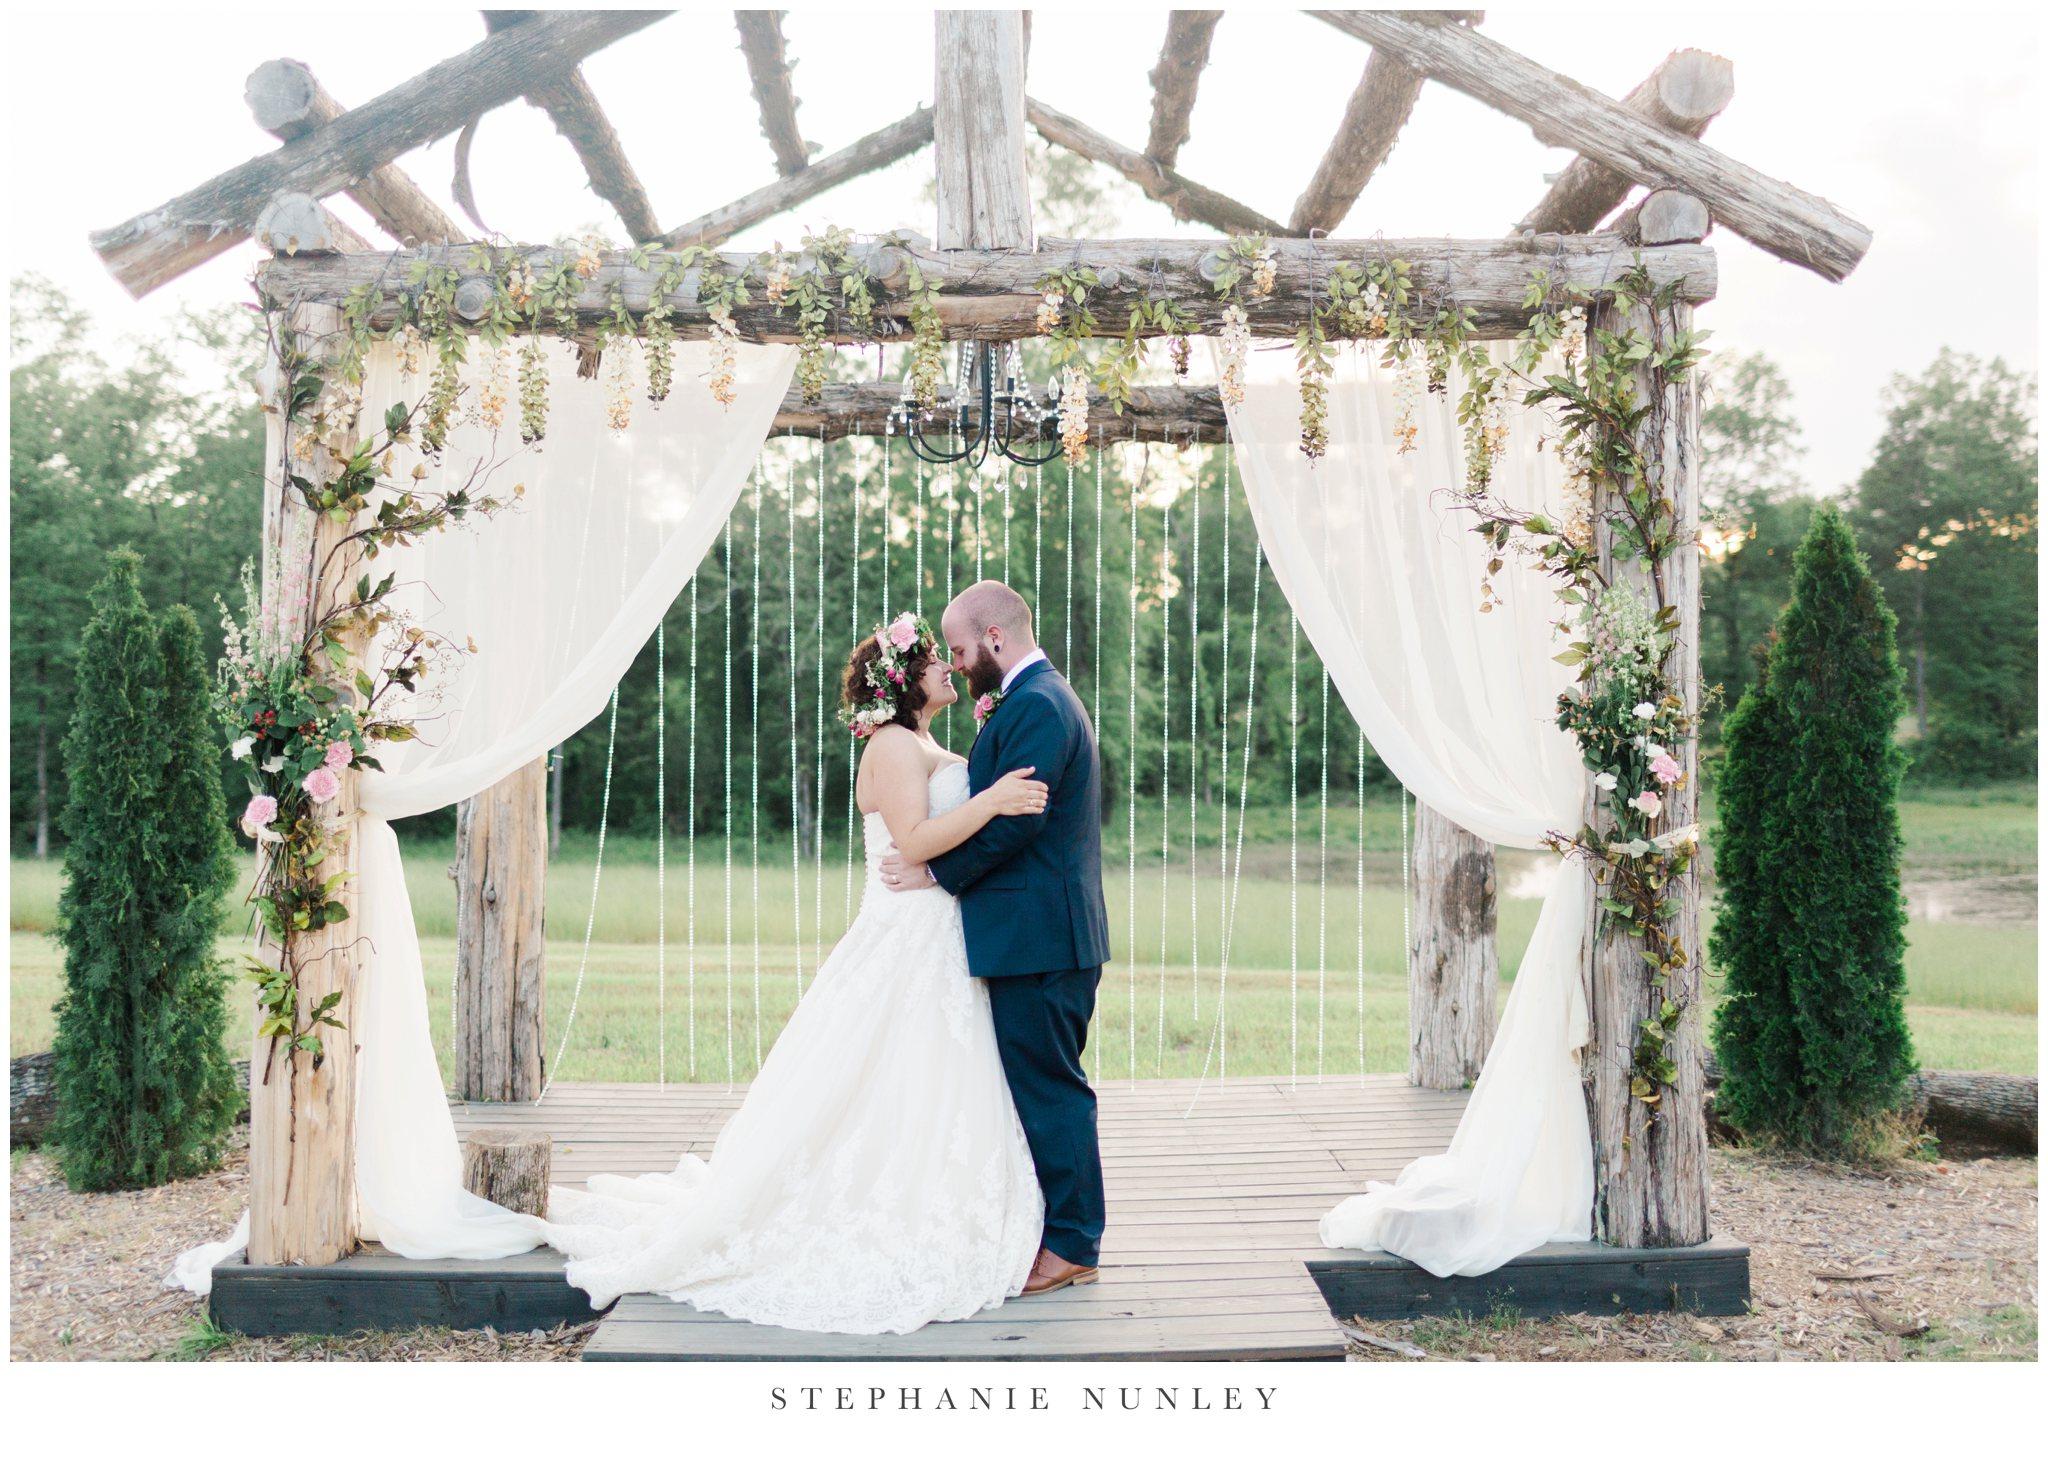 romantic-outdoor-wedding-with-flower-crown-0136.jpg